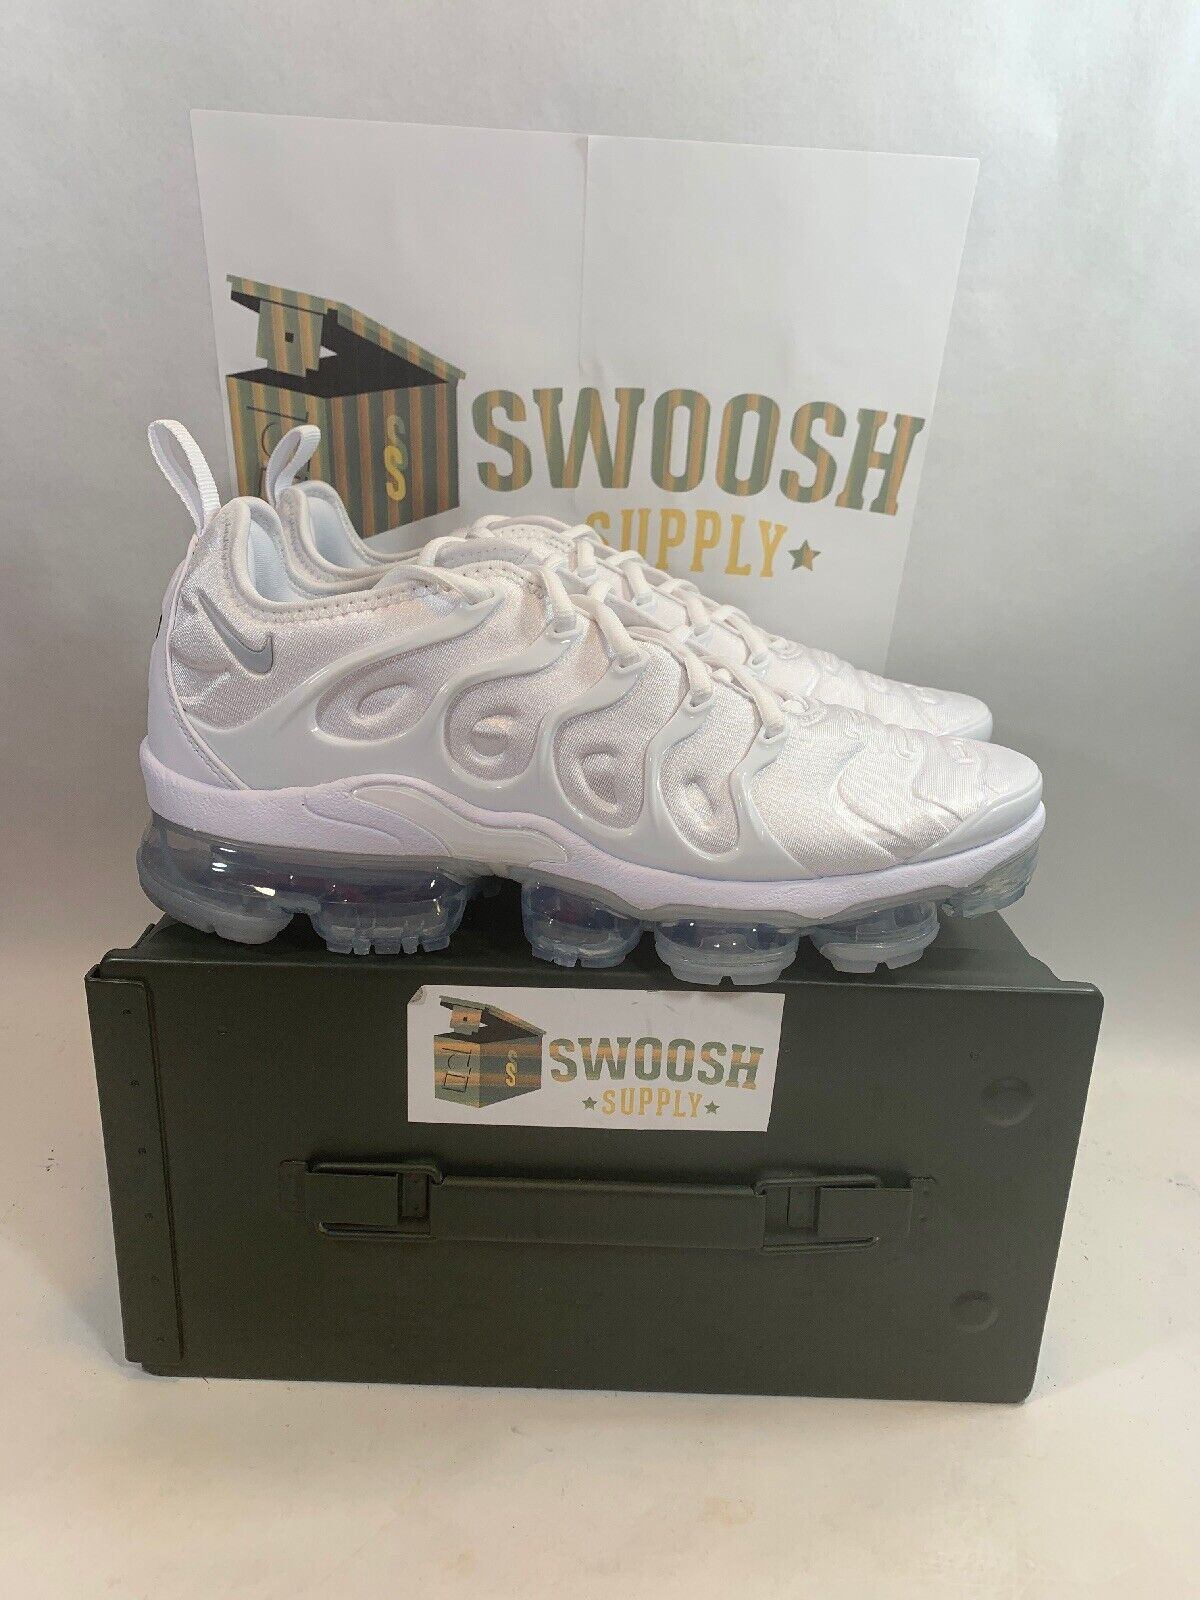 Nike Air Vapormax Triple White Pure Platinum Plus 924453-100 All White Sz 10.5